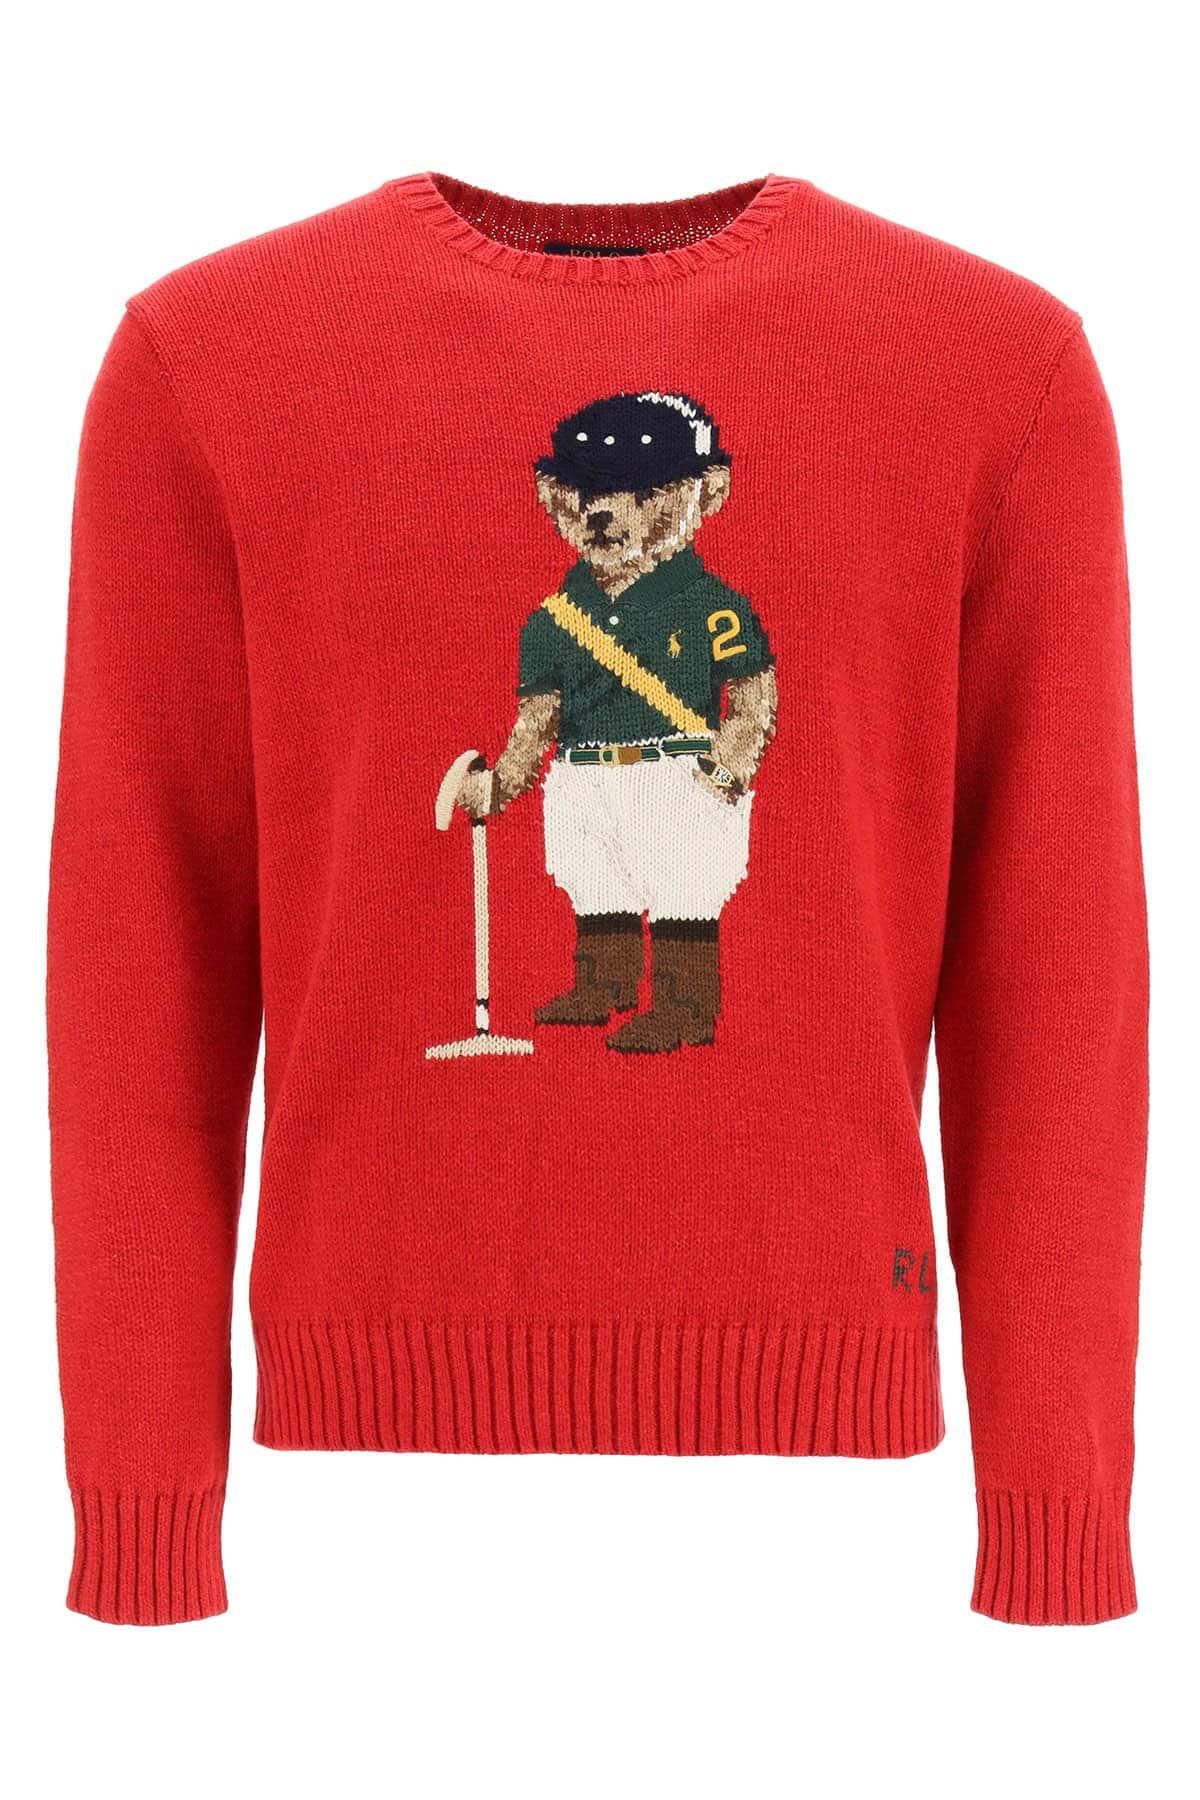 POLO RALPH LAUREN SWEATER POLO PLAYER BEAR L Red, Green, Beige Cotton